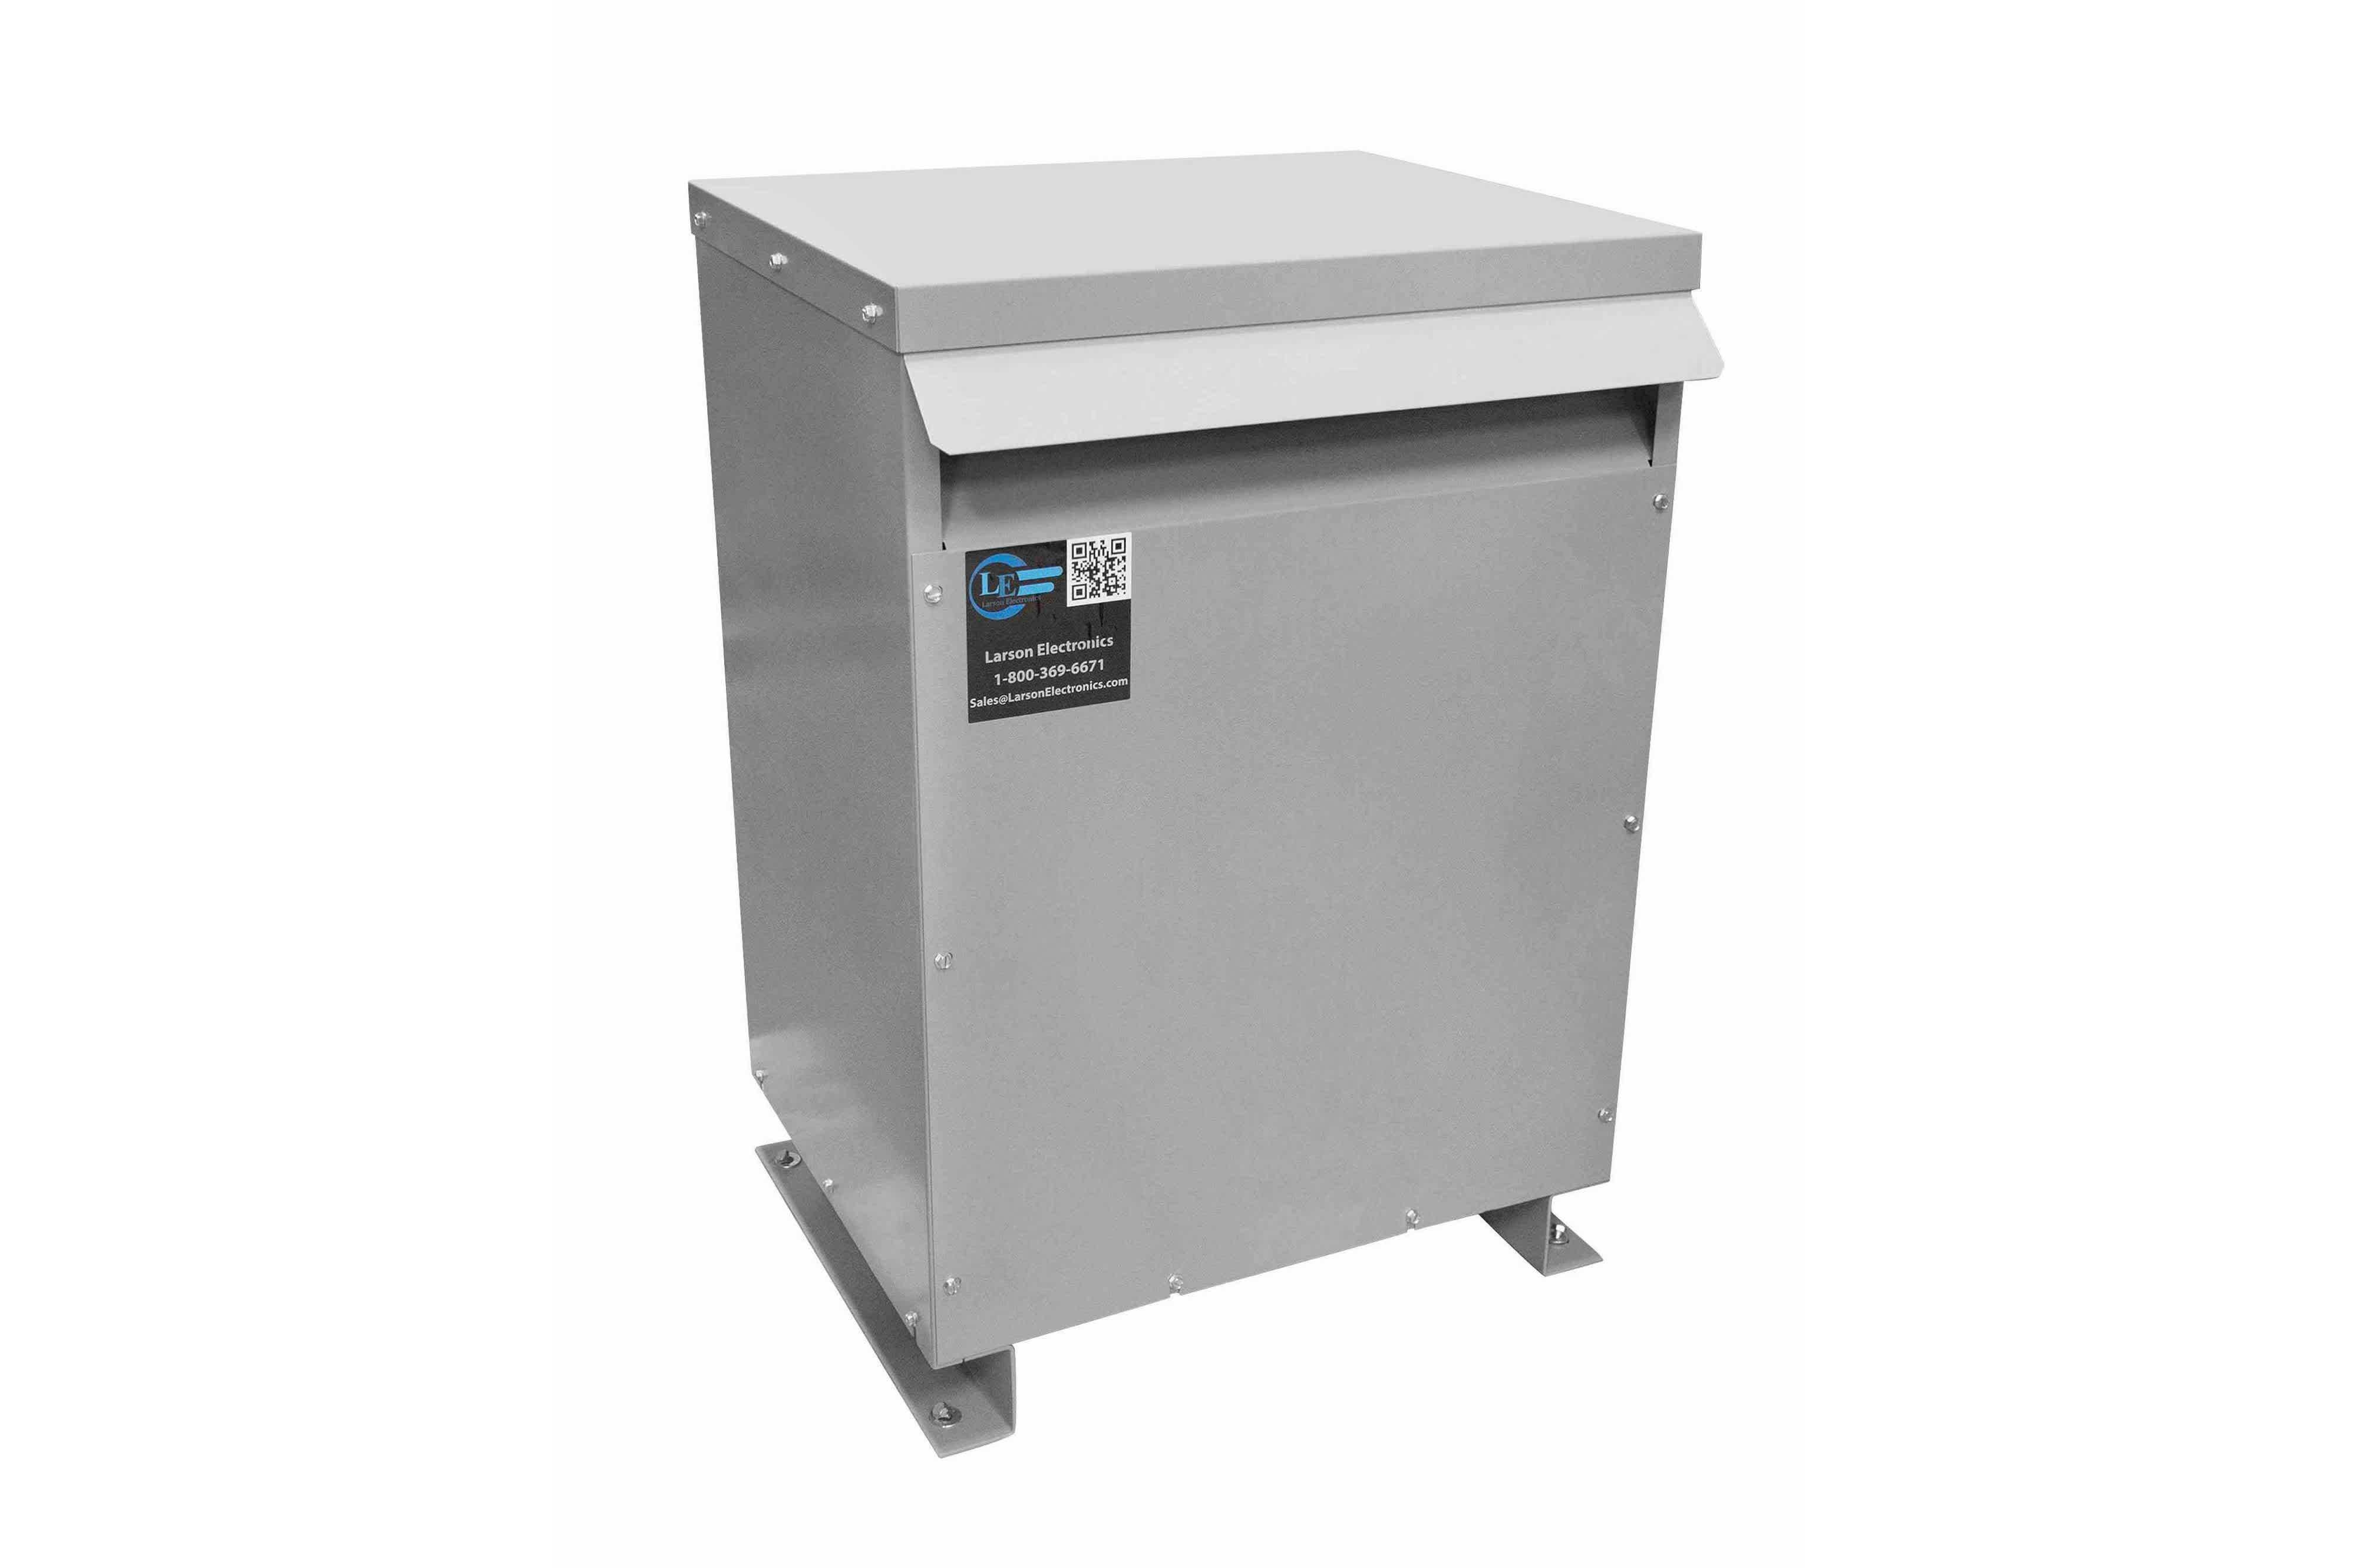 400 kVA 3PH Isolation Transformer, 575V Wye Primary, 415V Delta Secondary, N3R, Ventilated, 60 Hz